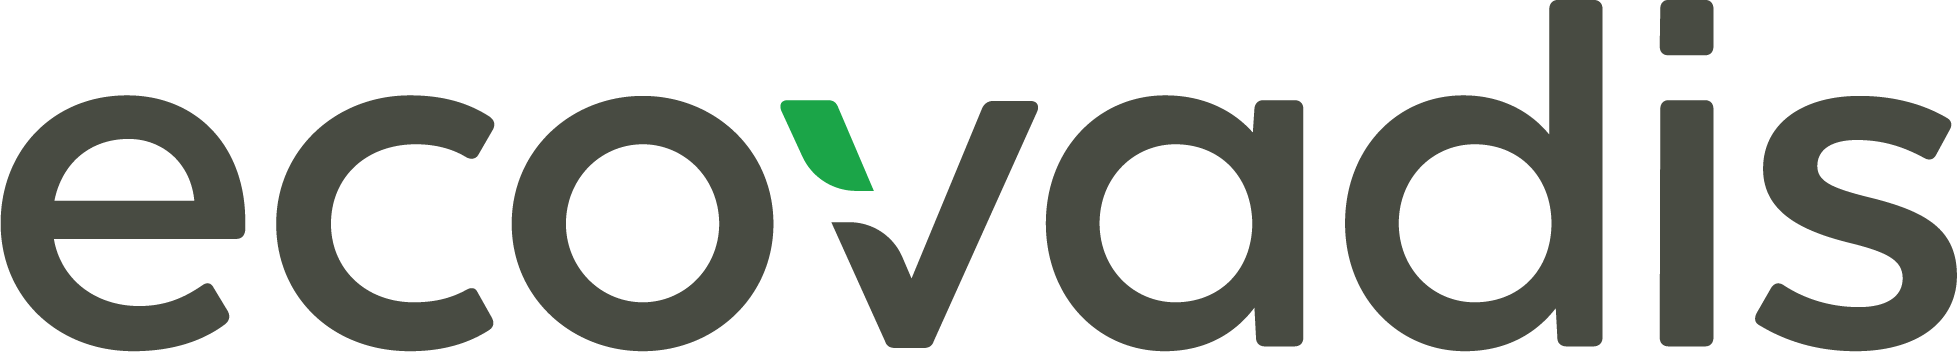 logo_fullcolor (1)